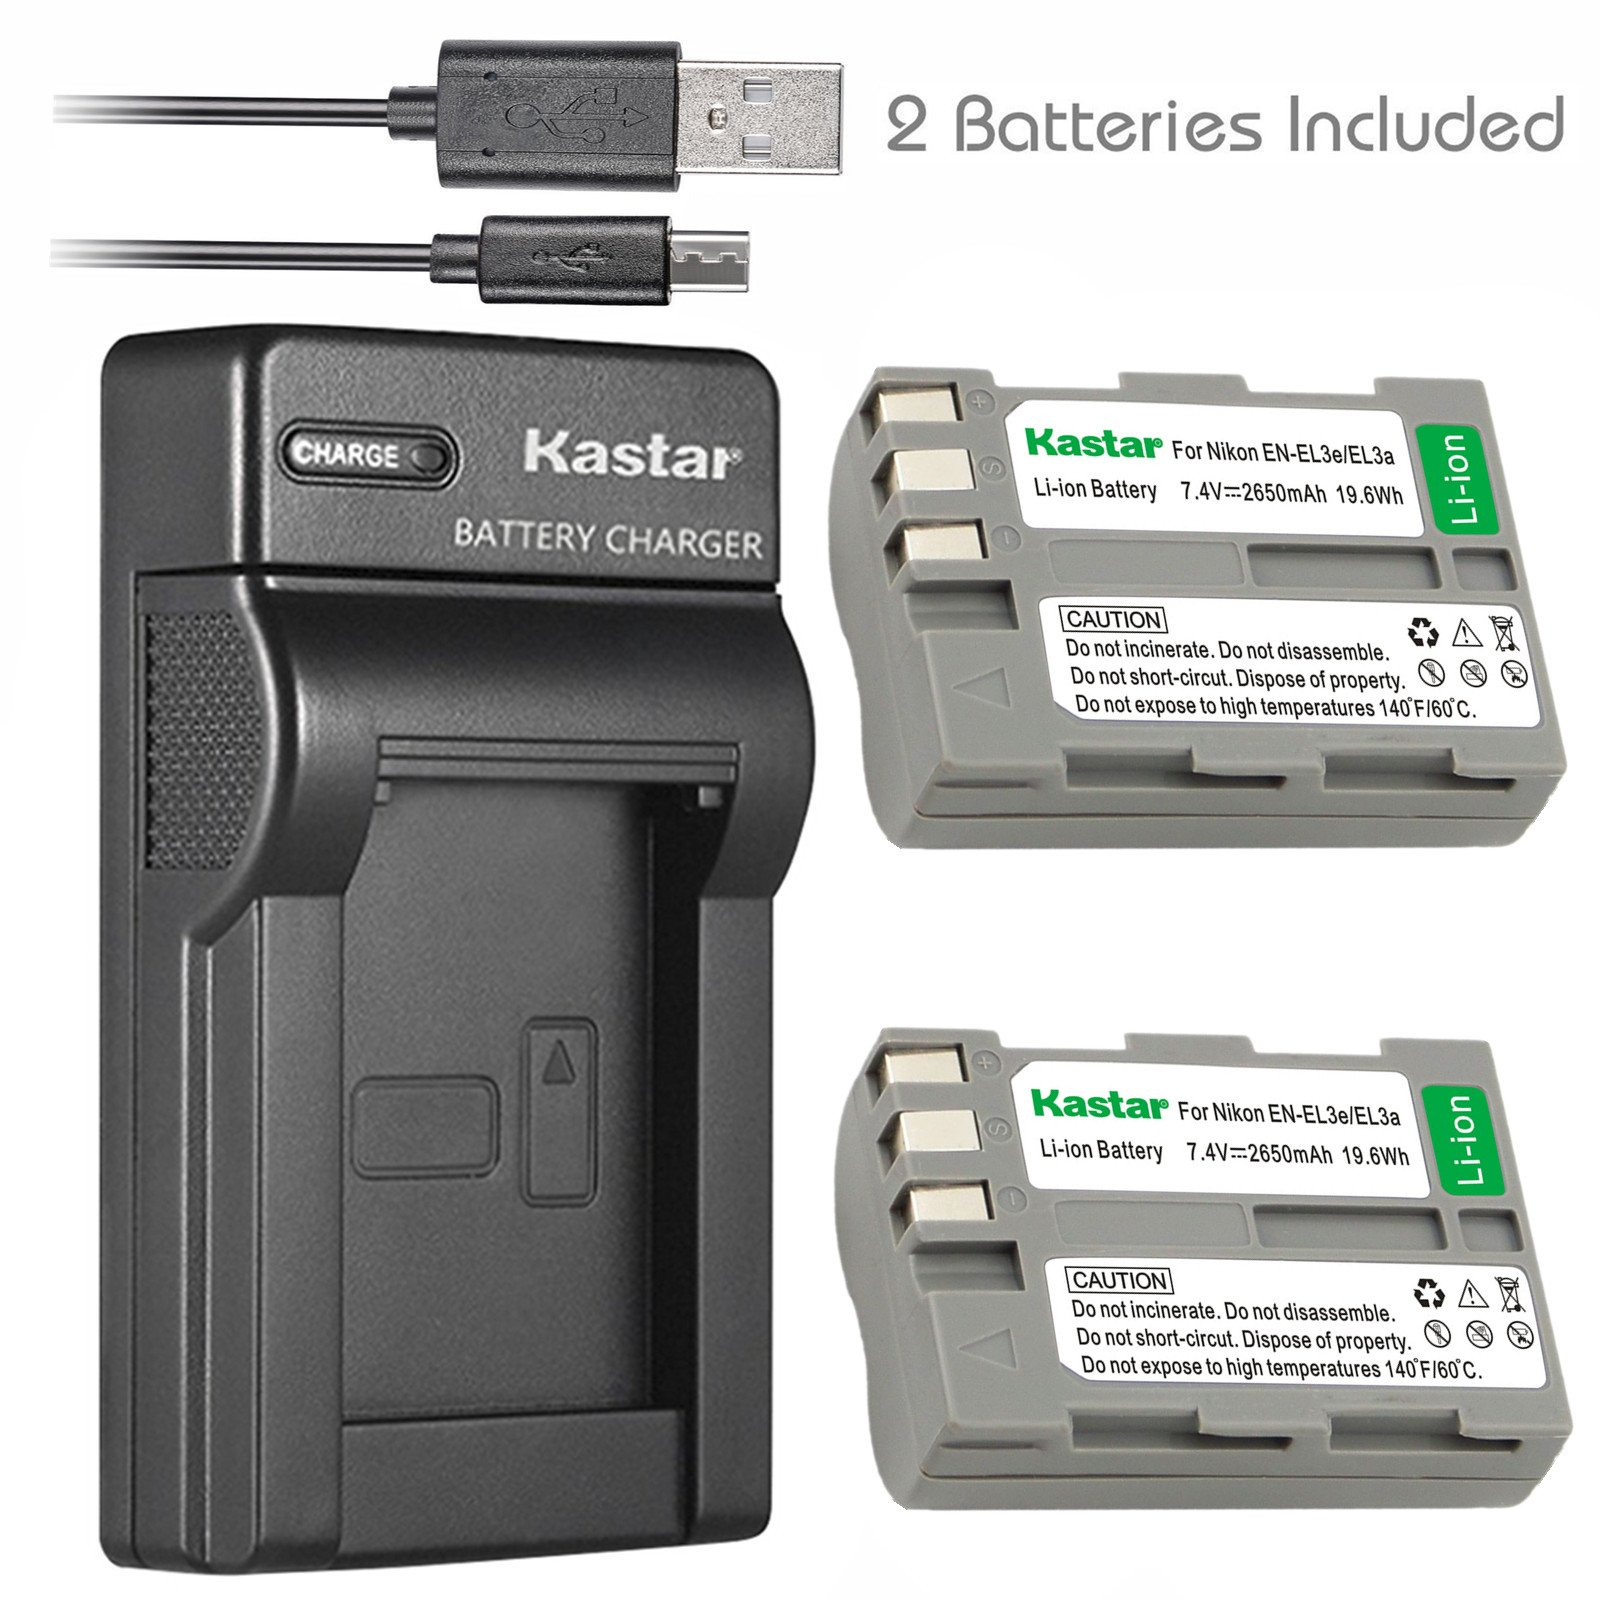 Kastar Battery (X2) & Slim USB Charger for Nikon EN-EL3e, ENEL3E, EN-EL3a, EN-EL3, MH-18, MH-18a and Nikon D50, D70, D70s, D80, D90, D100, D200, D300, D300S, D700 Cameras